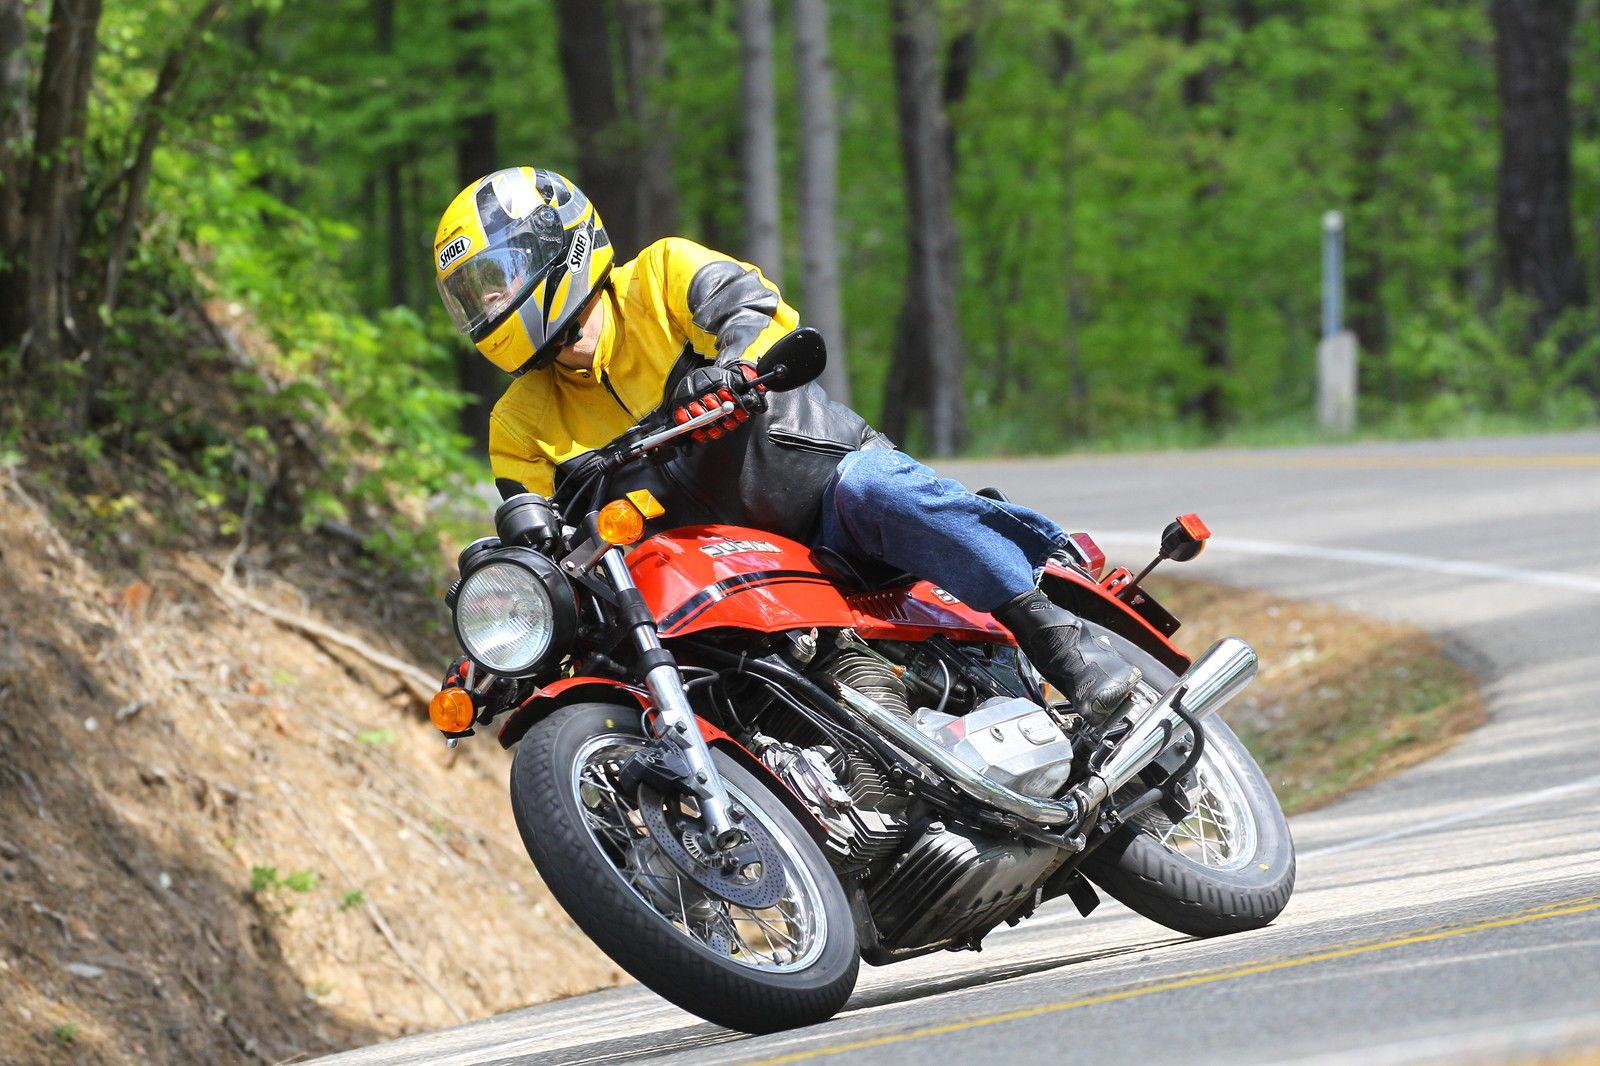 ugly duckling – 1975 ducati 860gt | bike-urious